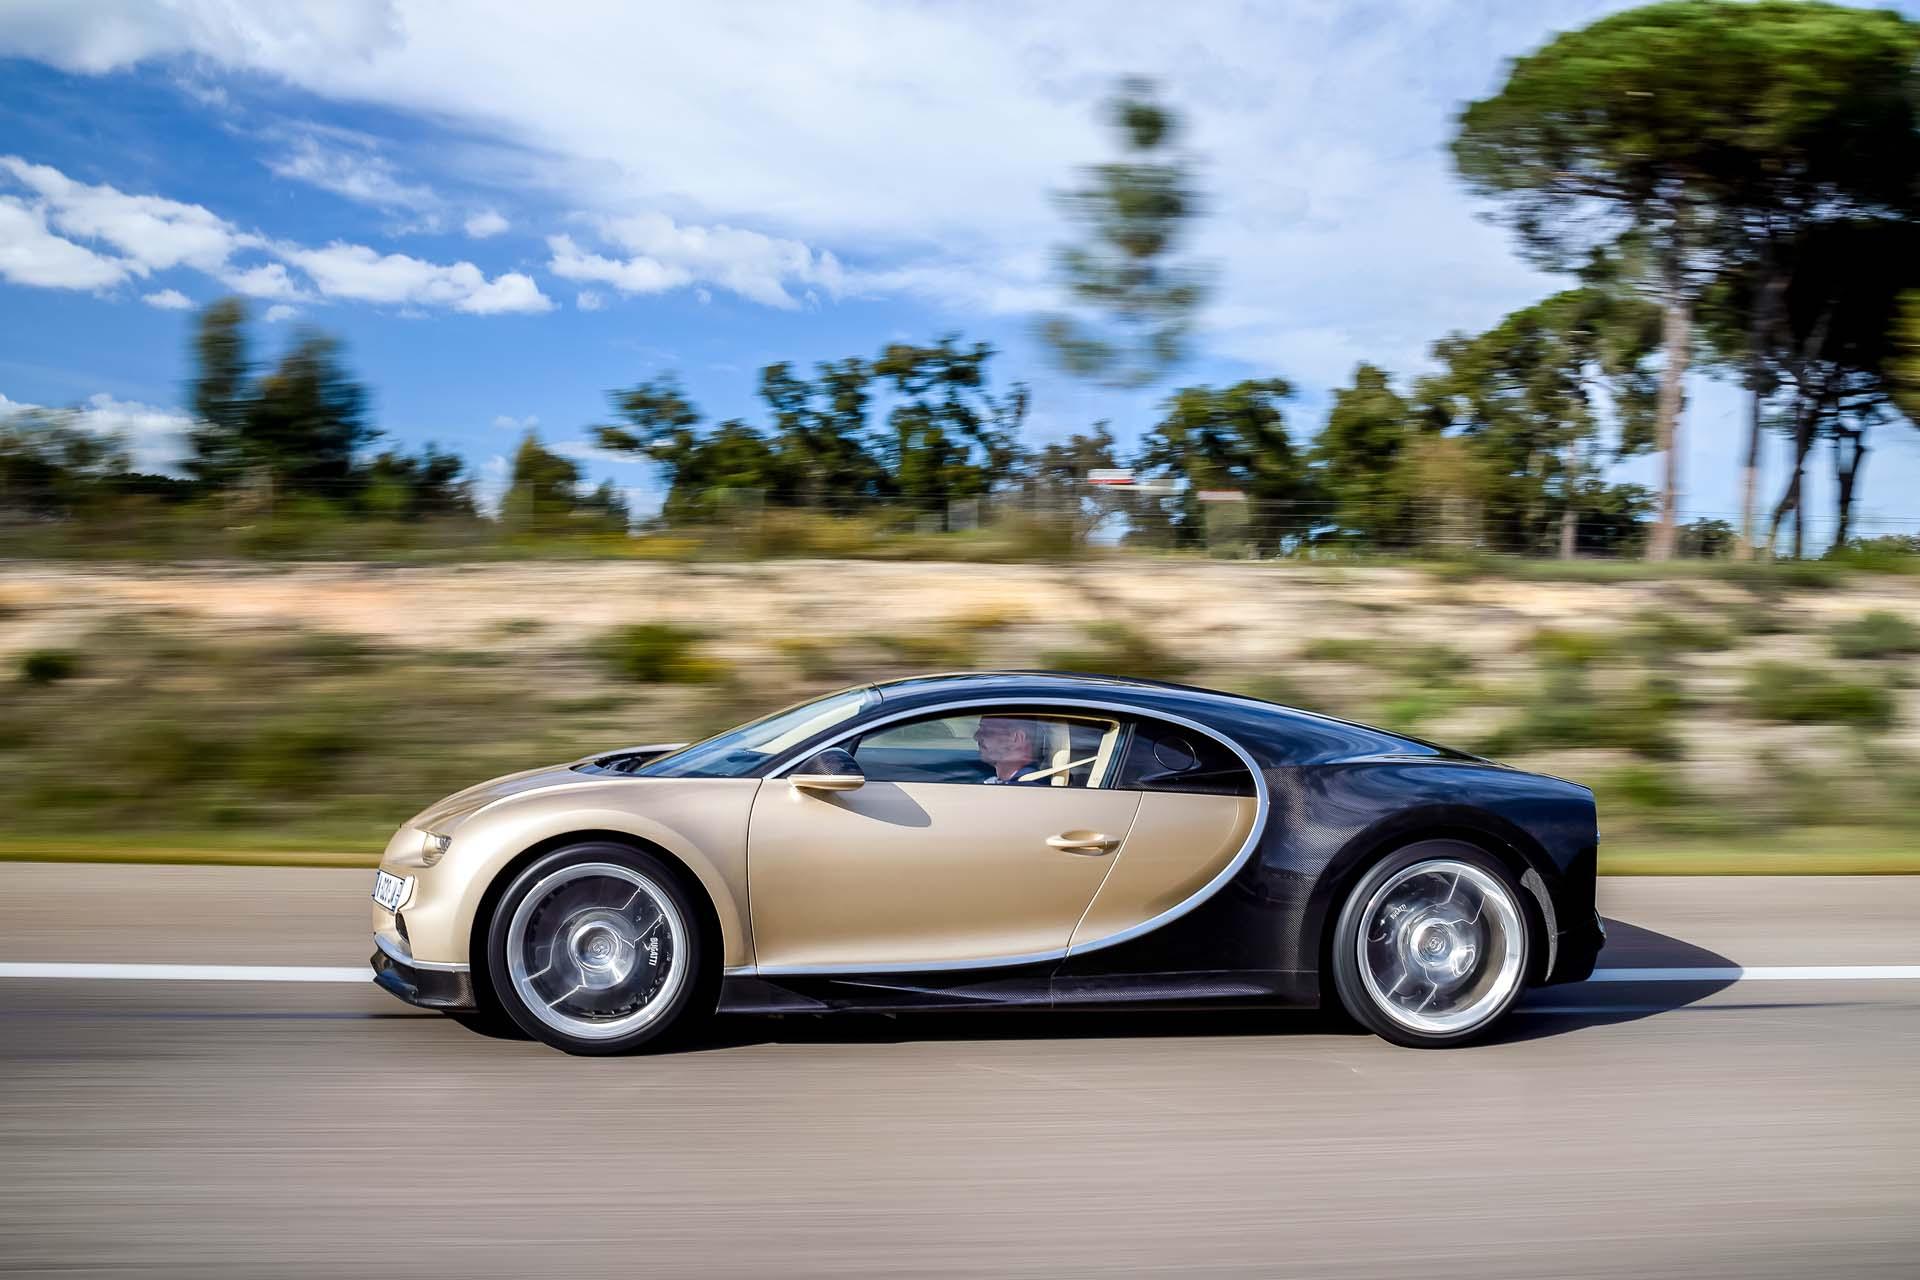 bugatti chiron fuel economy ratings better than veyron still dismal. Black Bedroom Furniture Sets. Home Design Ideas